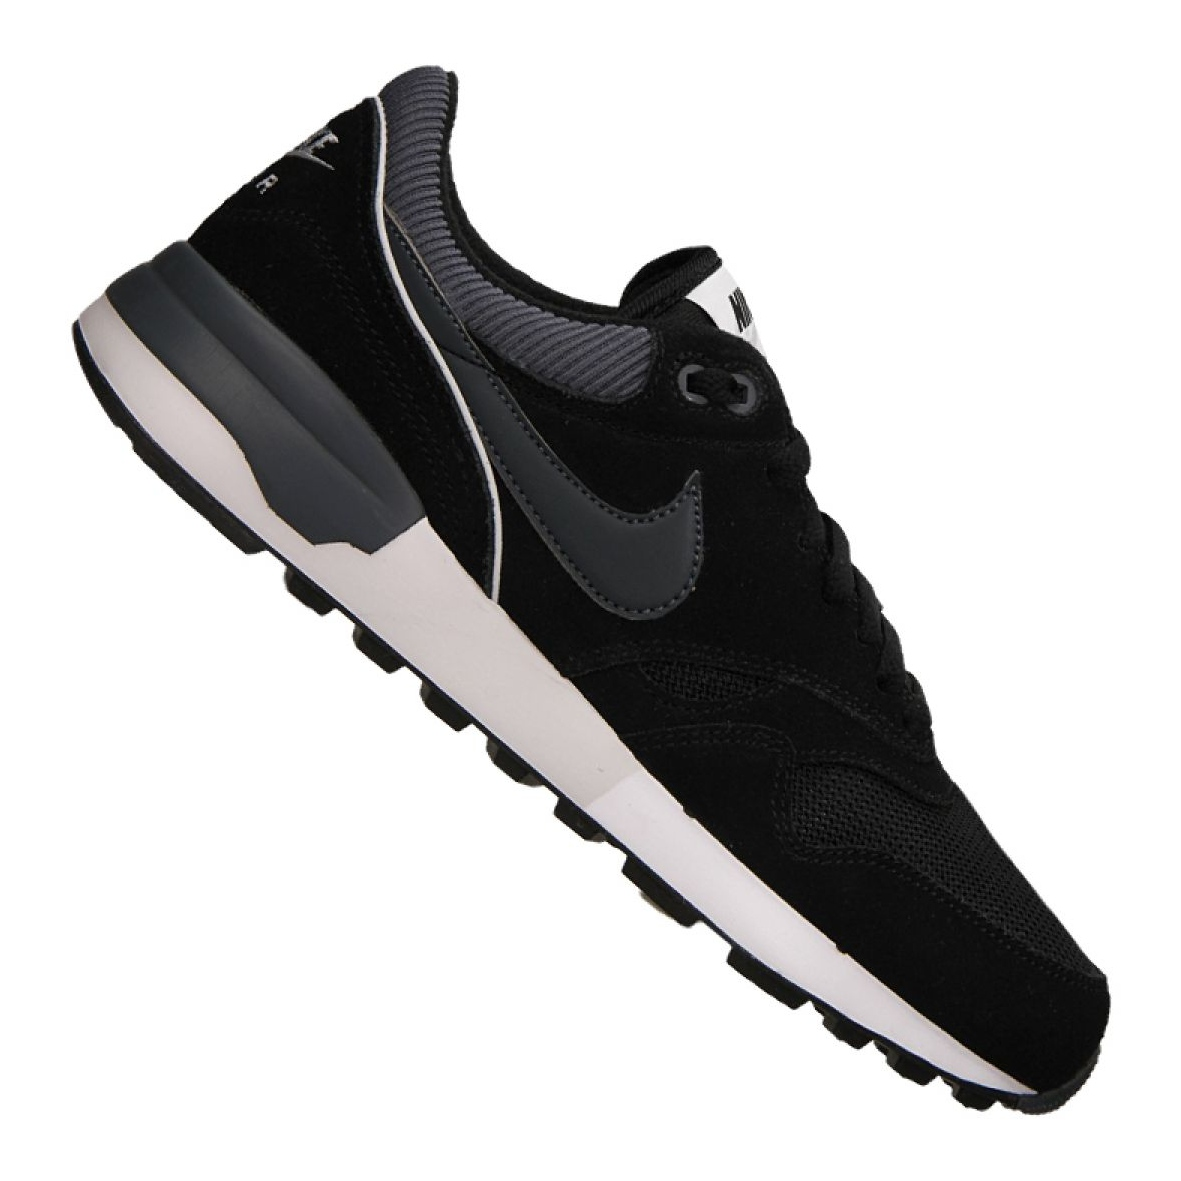 Sapatilhas Nike Air Max Odyssey M 652989 001 preto